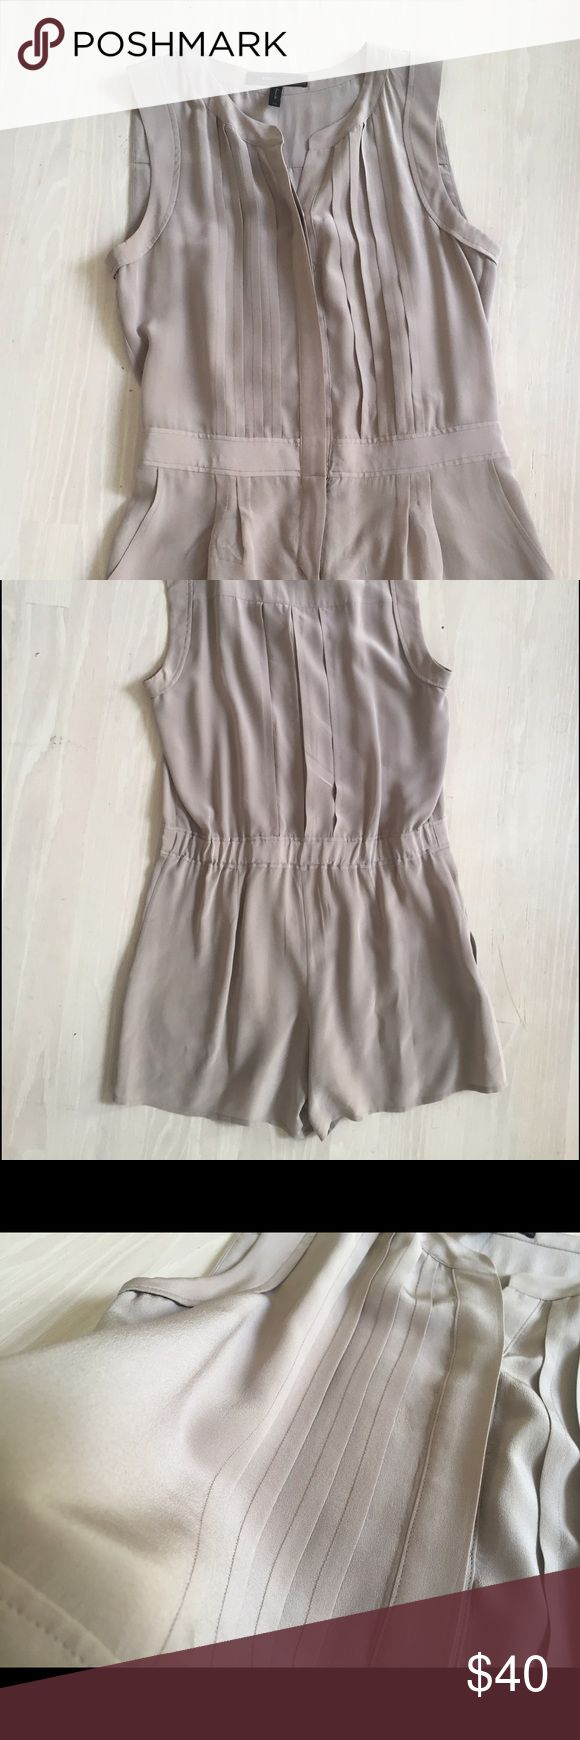 BCBG SILK JUMPSUIT / ROMPER Lovely khaki/nude shorts jumpsuit in silk. Size XS. BCBG Other